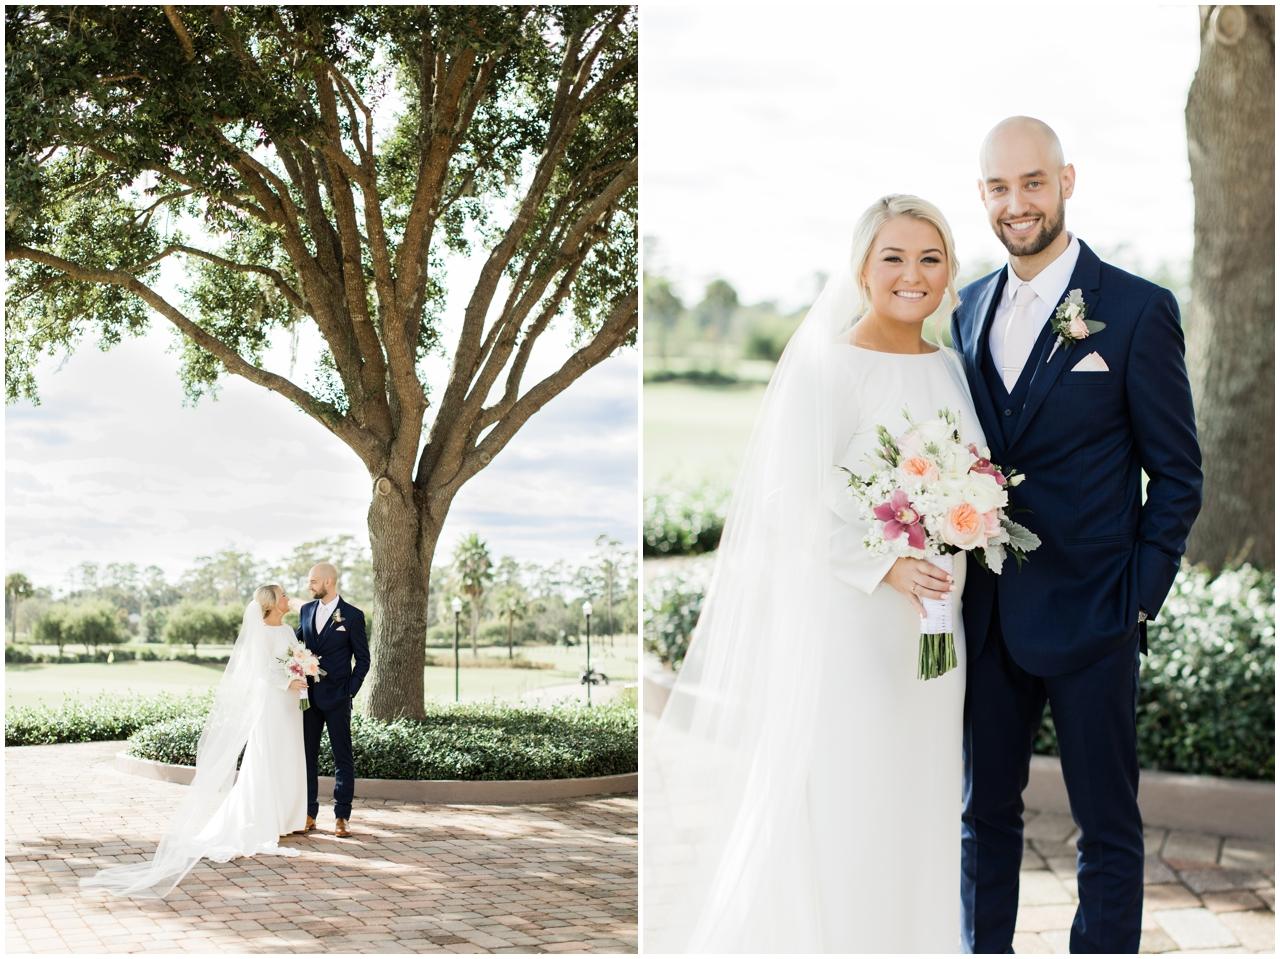 Jacksonville-Wedding-photographers-brooke-images-TPC-Sawgrass-Wedding-Mary-Kevin-blog_0012.jpg